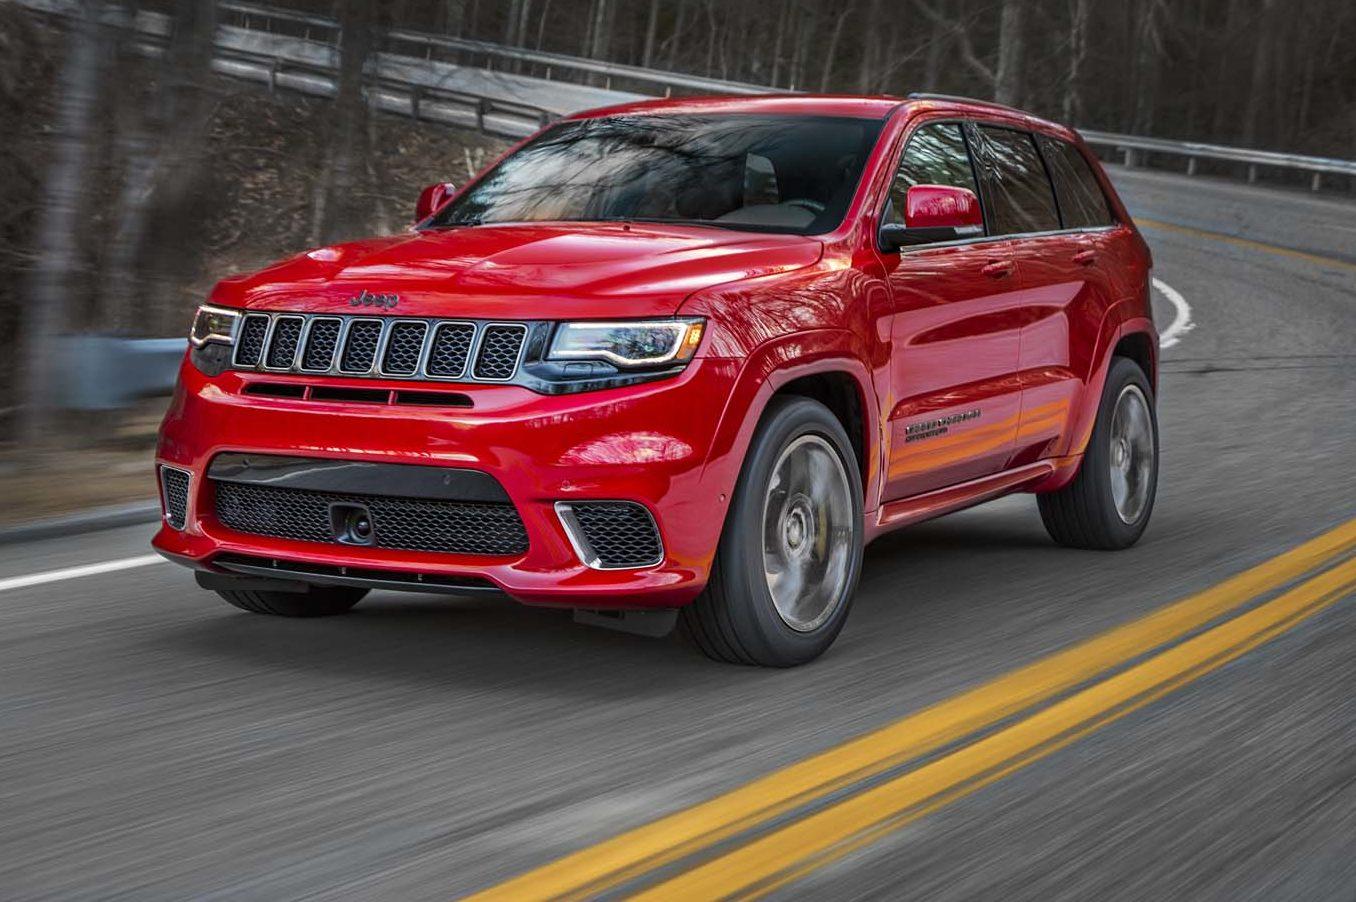 2018 jeep grand cherokee trackhawk recalled over fuel line. Black Bedroom Furniture Sets. Home Design Ideas